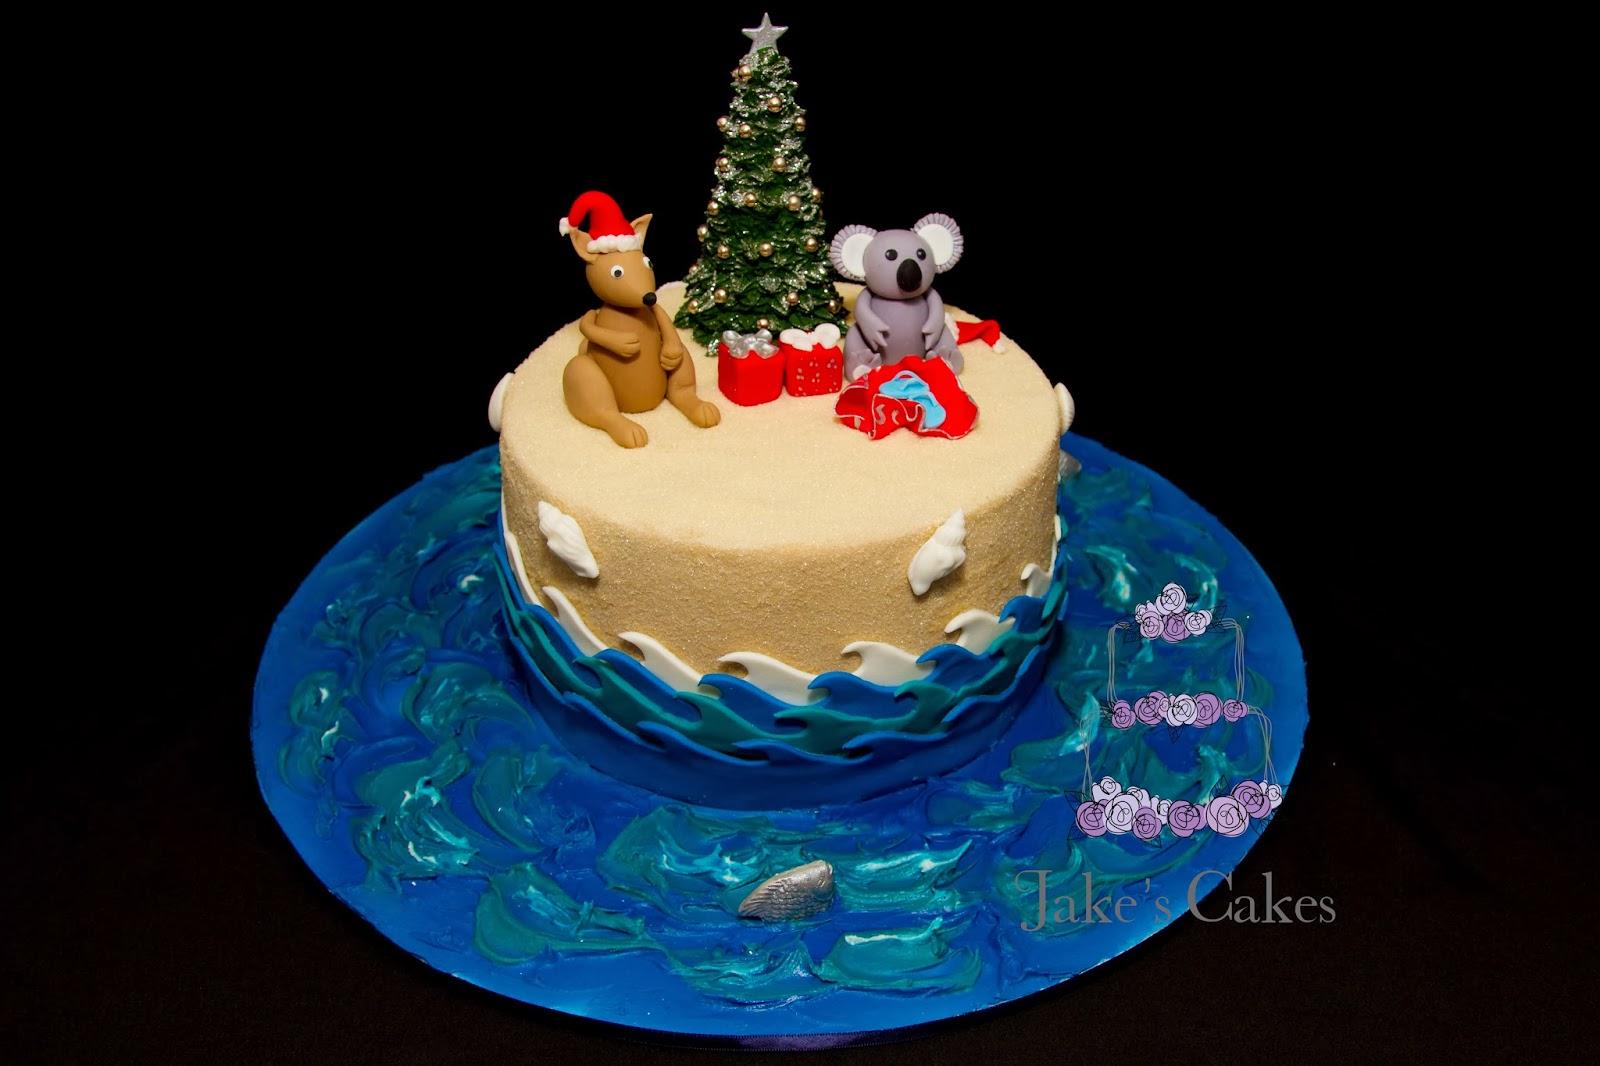 Jakes Cakes An Australian Christmas Cake